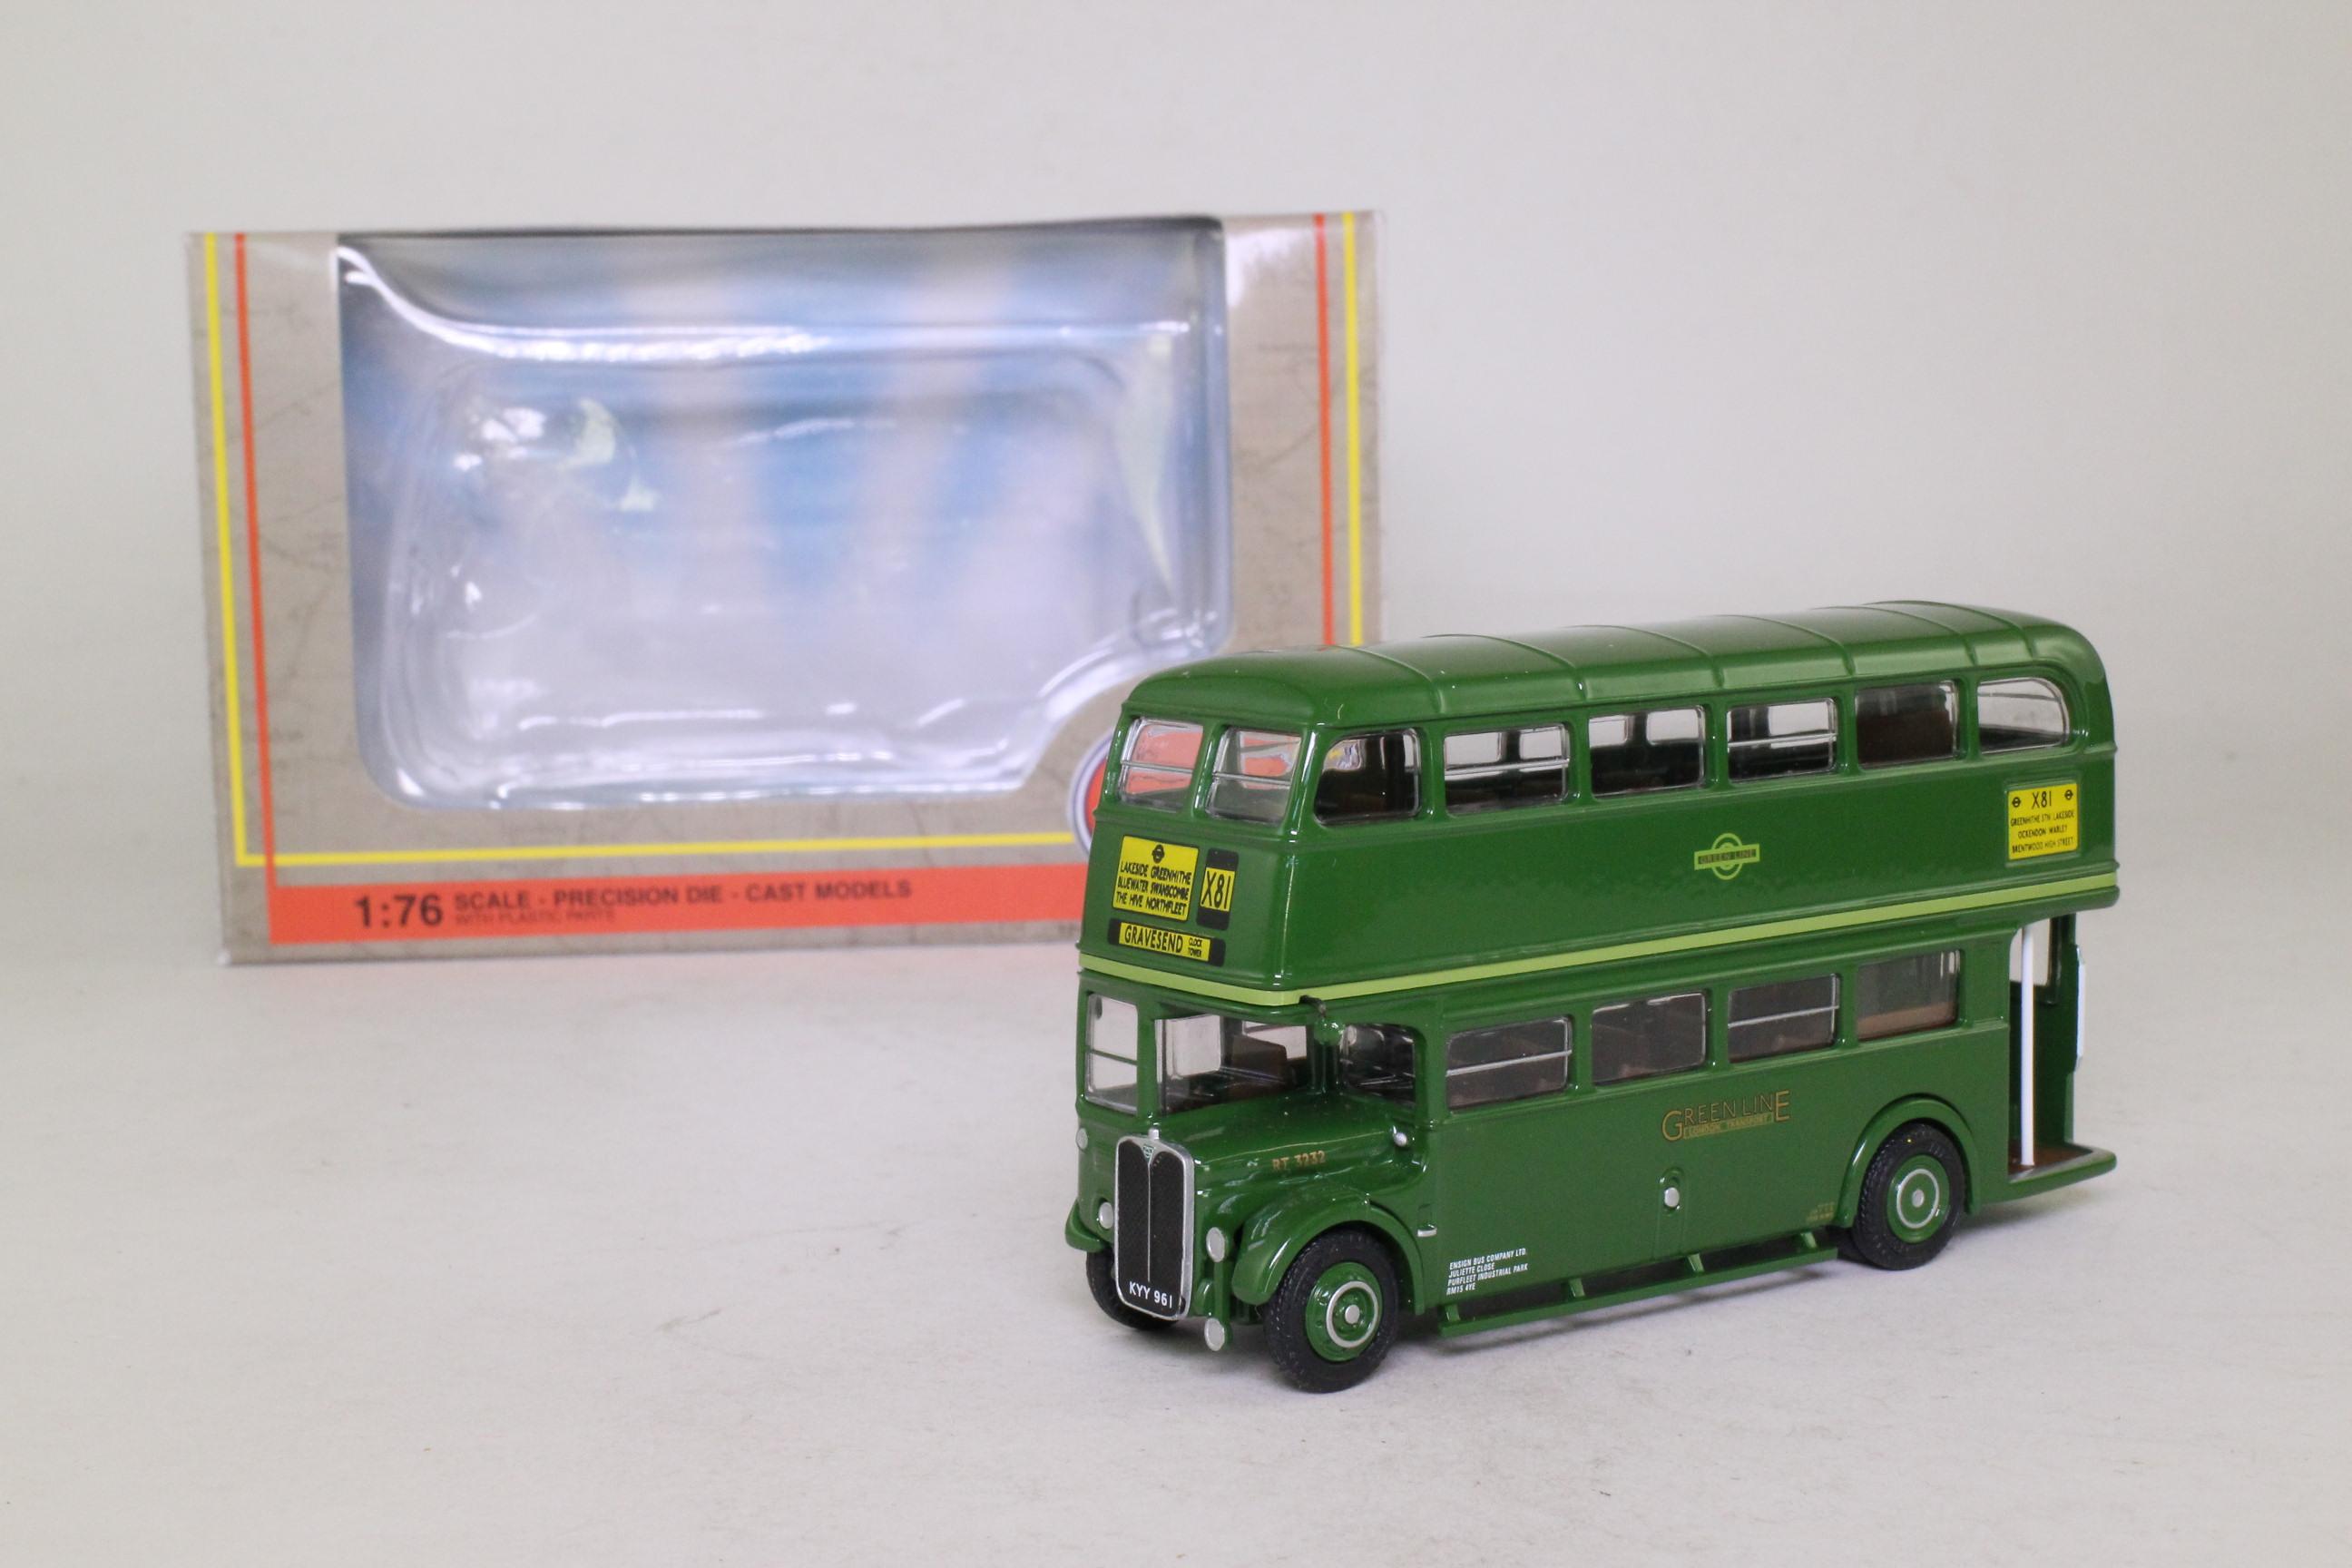 EFE 34109; AEC RT Double Deck Bus; Green Line; X81 Gravesend Clock Tower